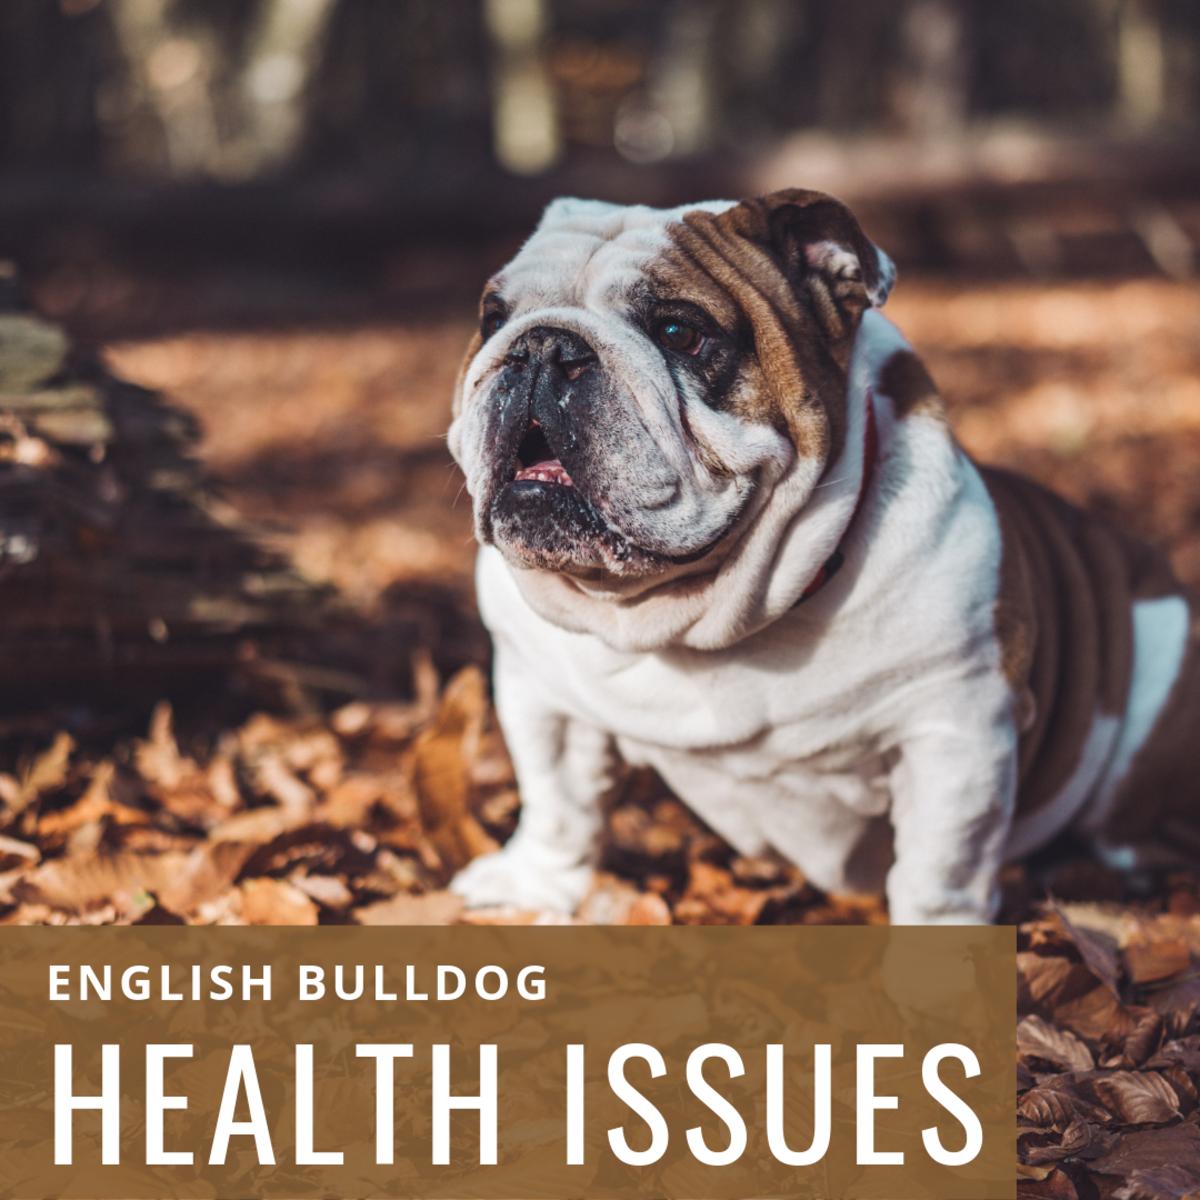 Raising Awareness About English Bulldog Health Issues